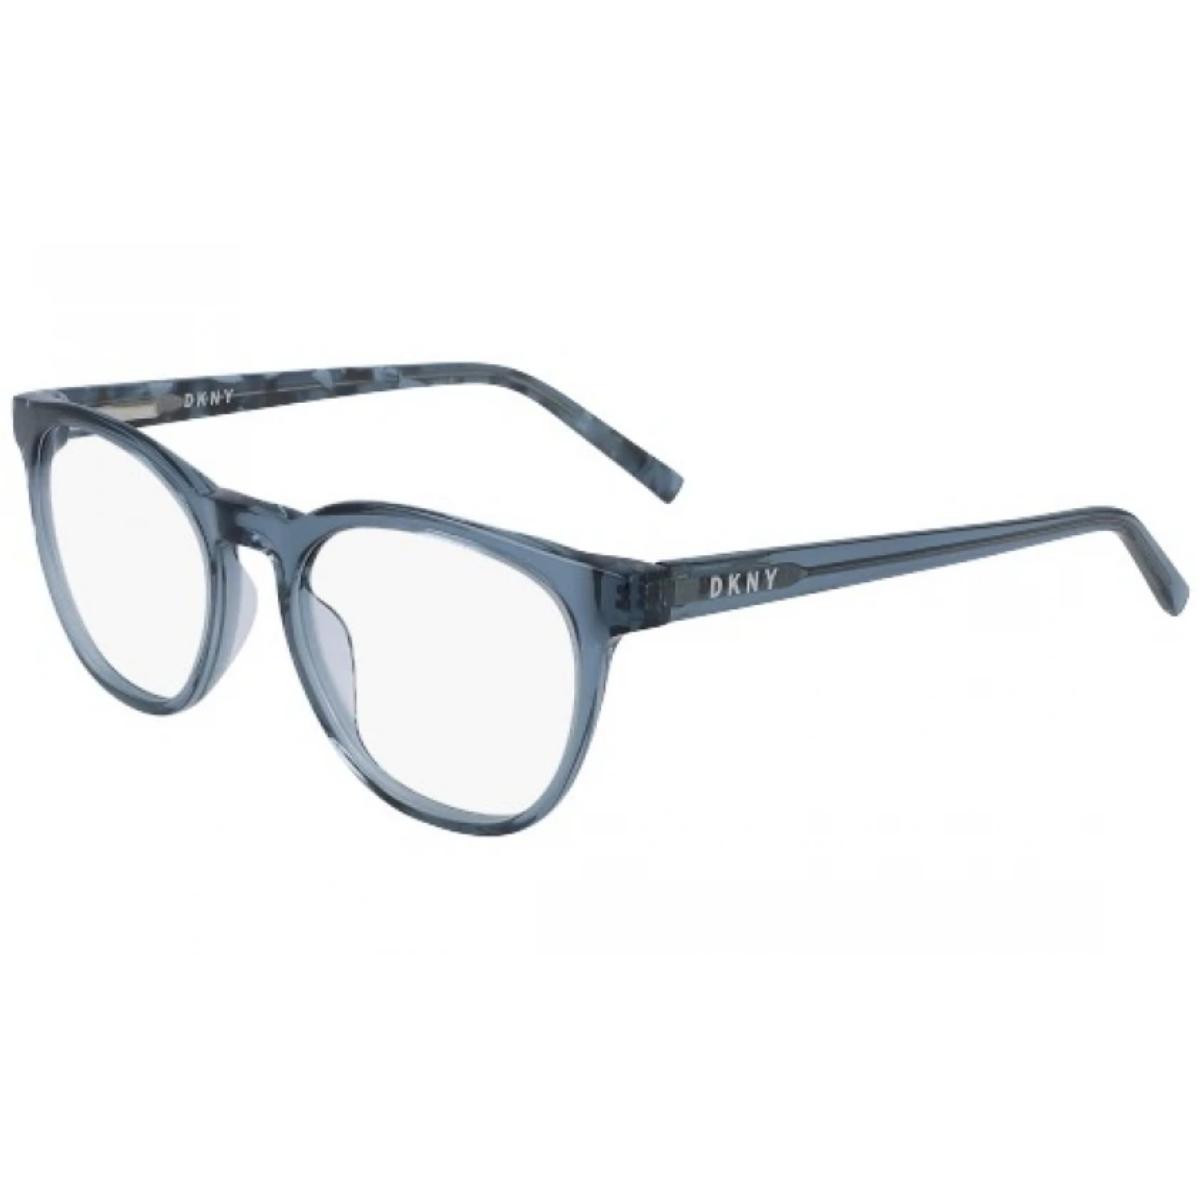 Óculos de Grau Feminino DKNY DK5000